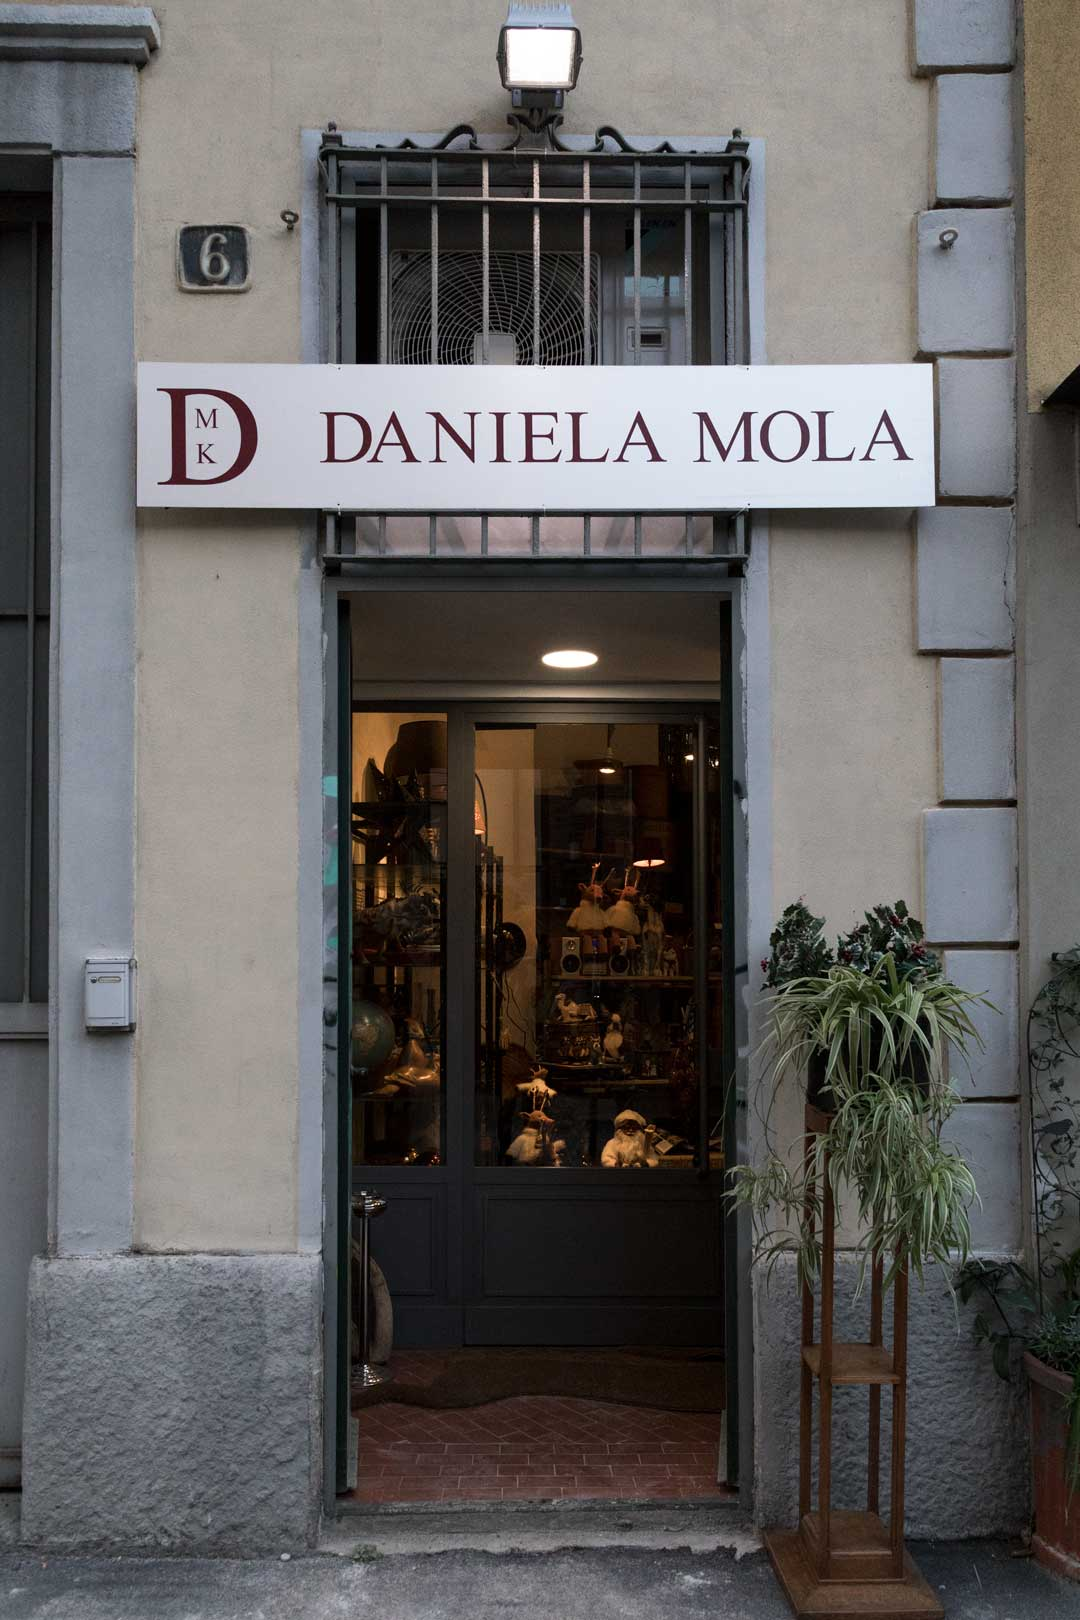 DMK - Daniela Mola | Milano